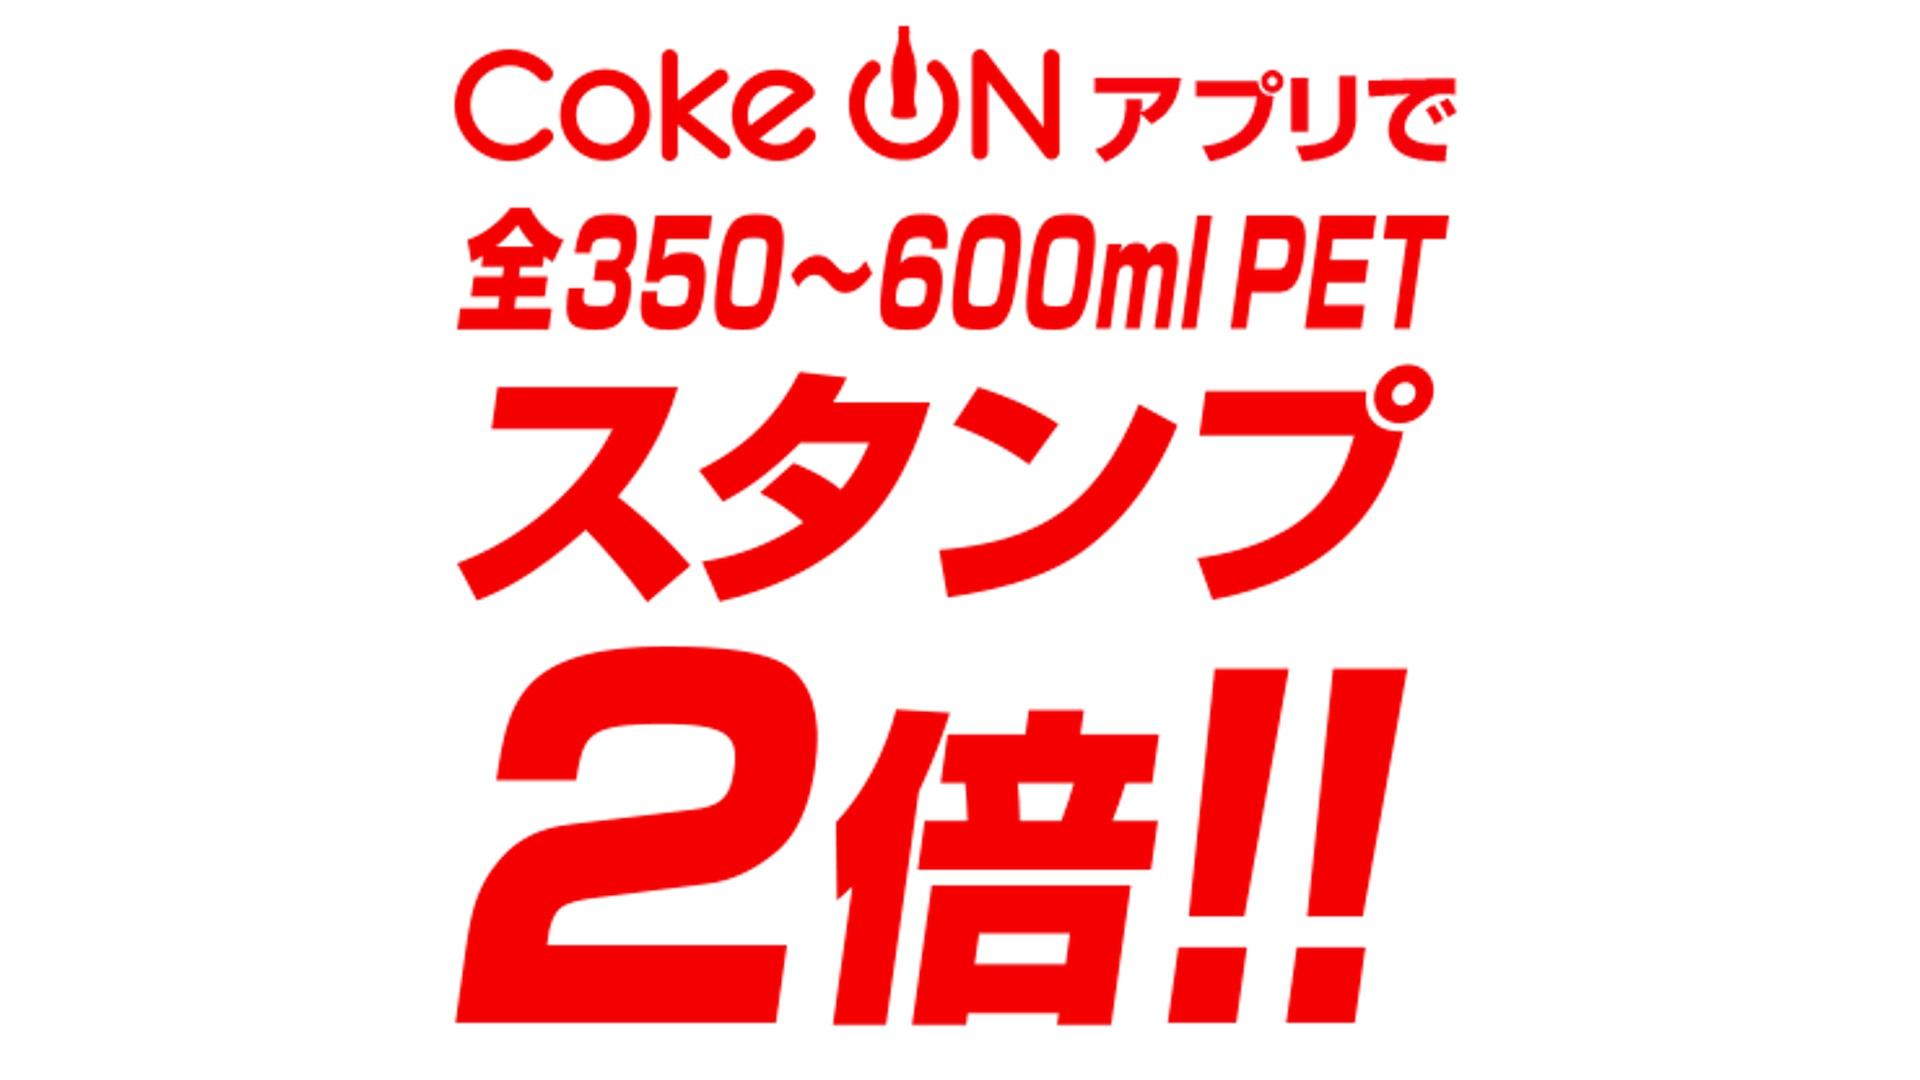 350ml以上のペットボトル飲料対象に「Coke ON」スタンプ2倍キャンペーン実施中